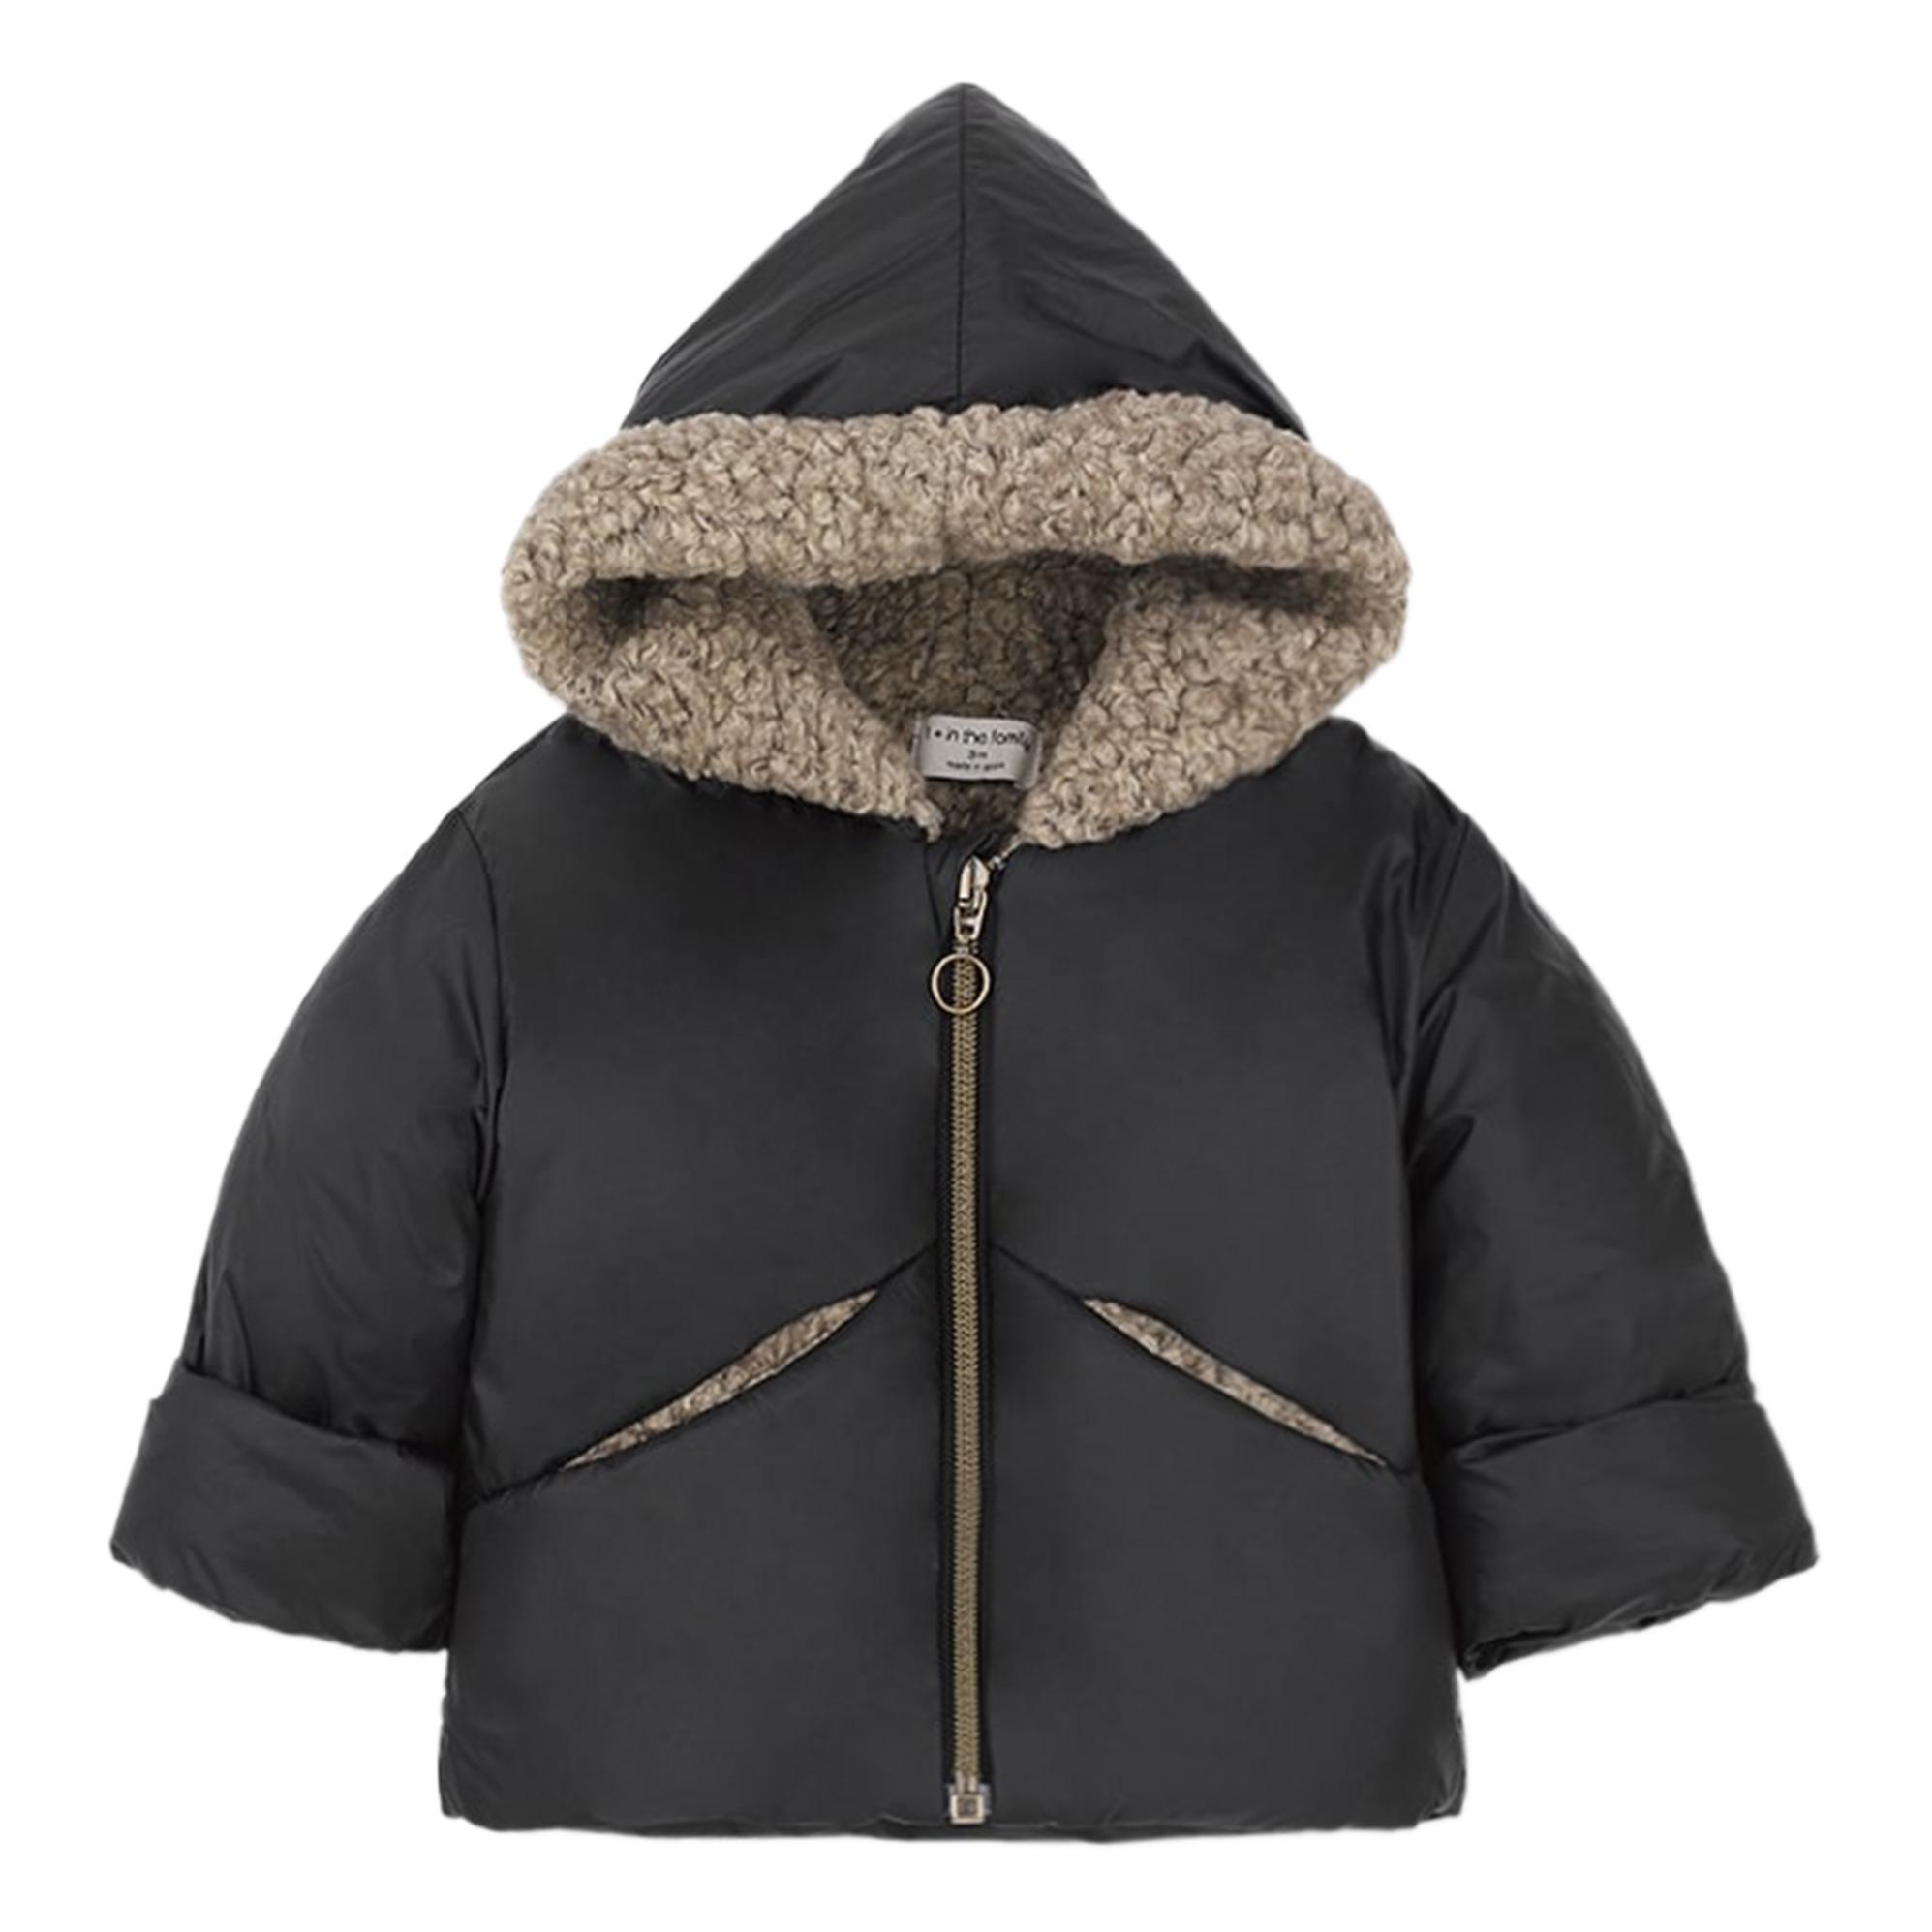 Kids Clothing ⋅ Kids Fashion ⋅ Smallable